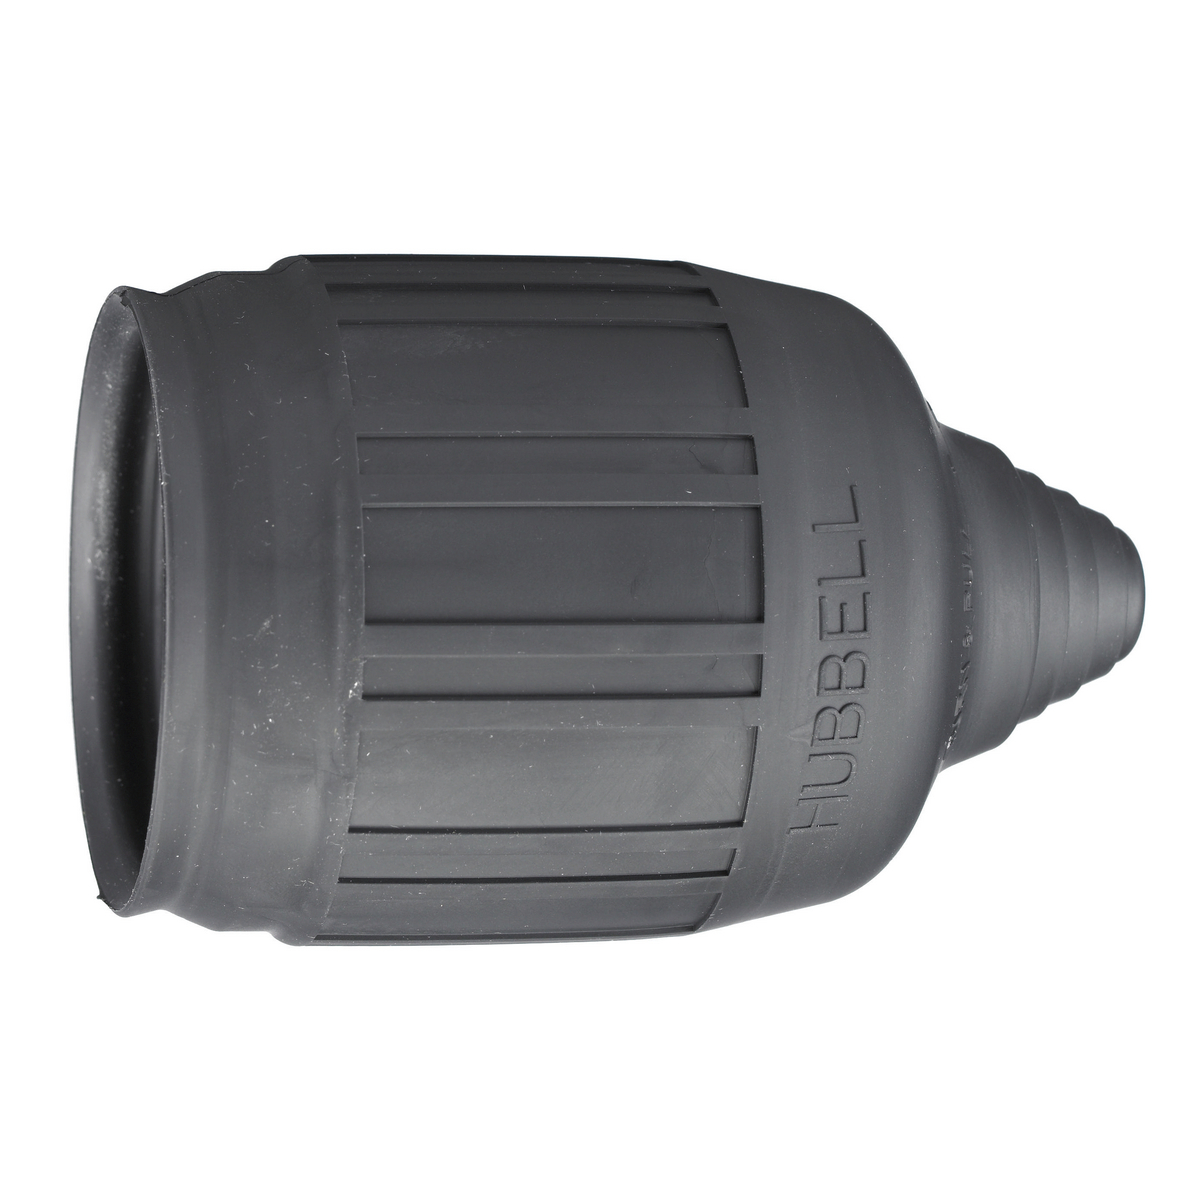 Hubbell HBL6035 Black Straight Blade Weatherproof Boot